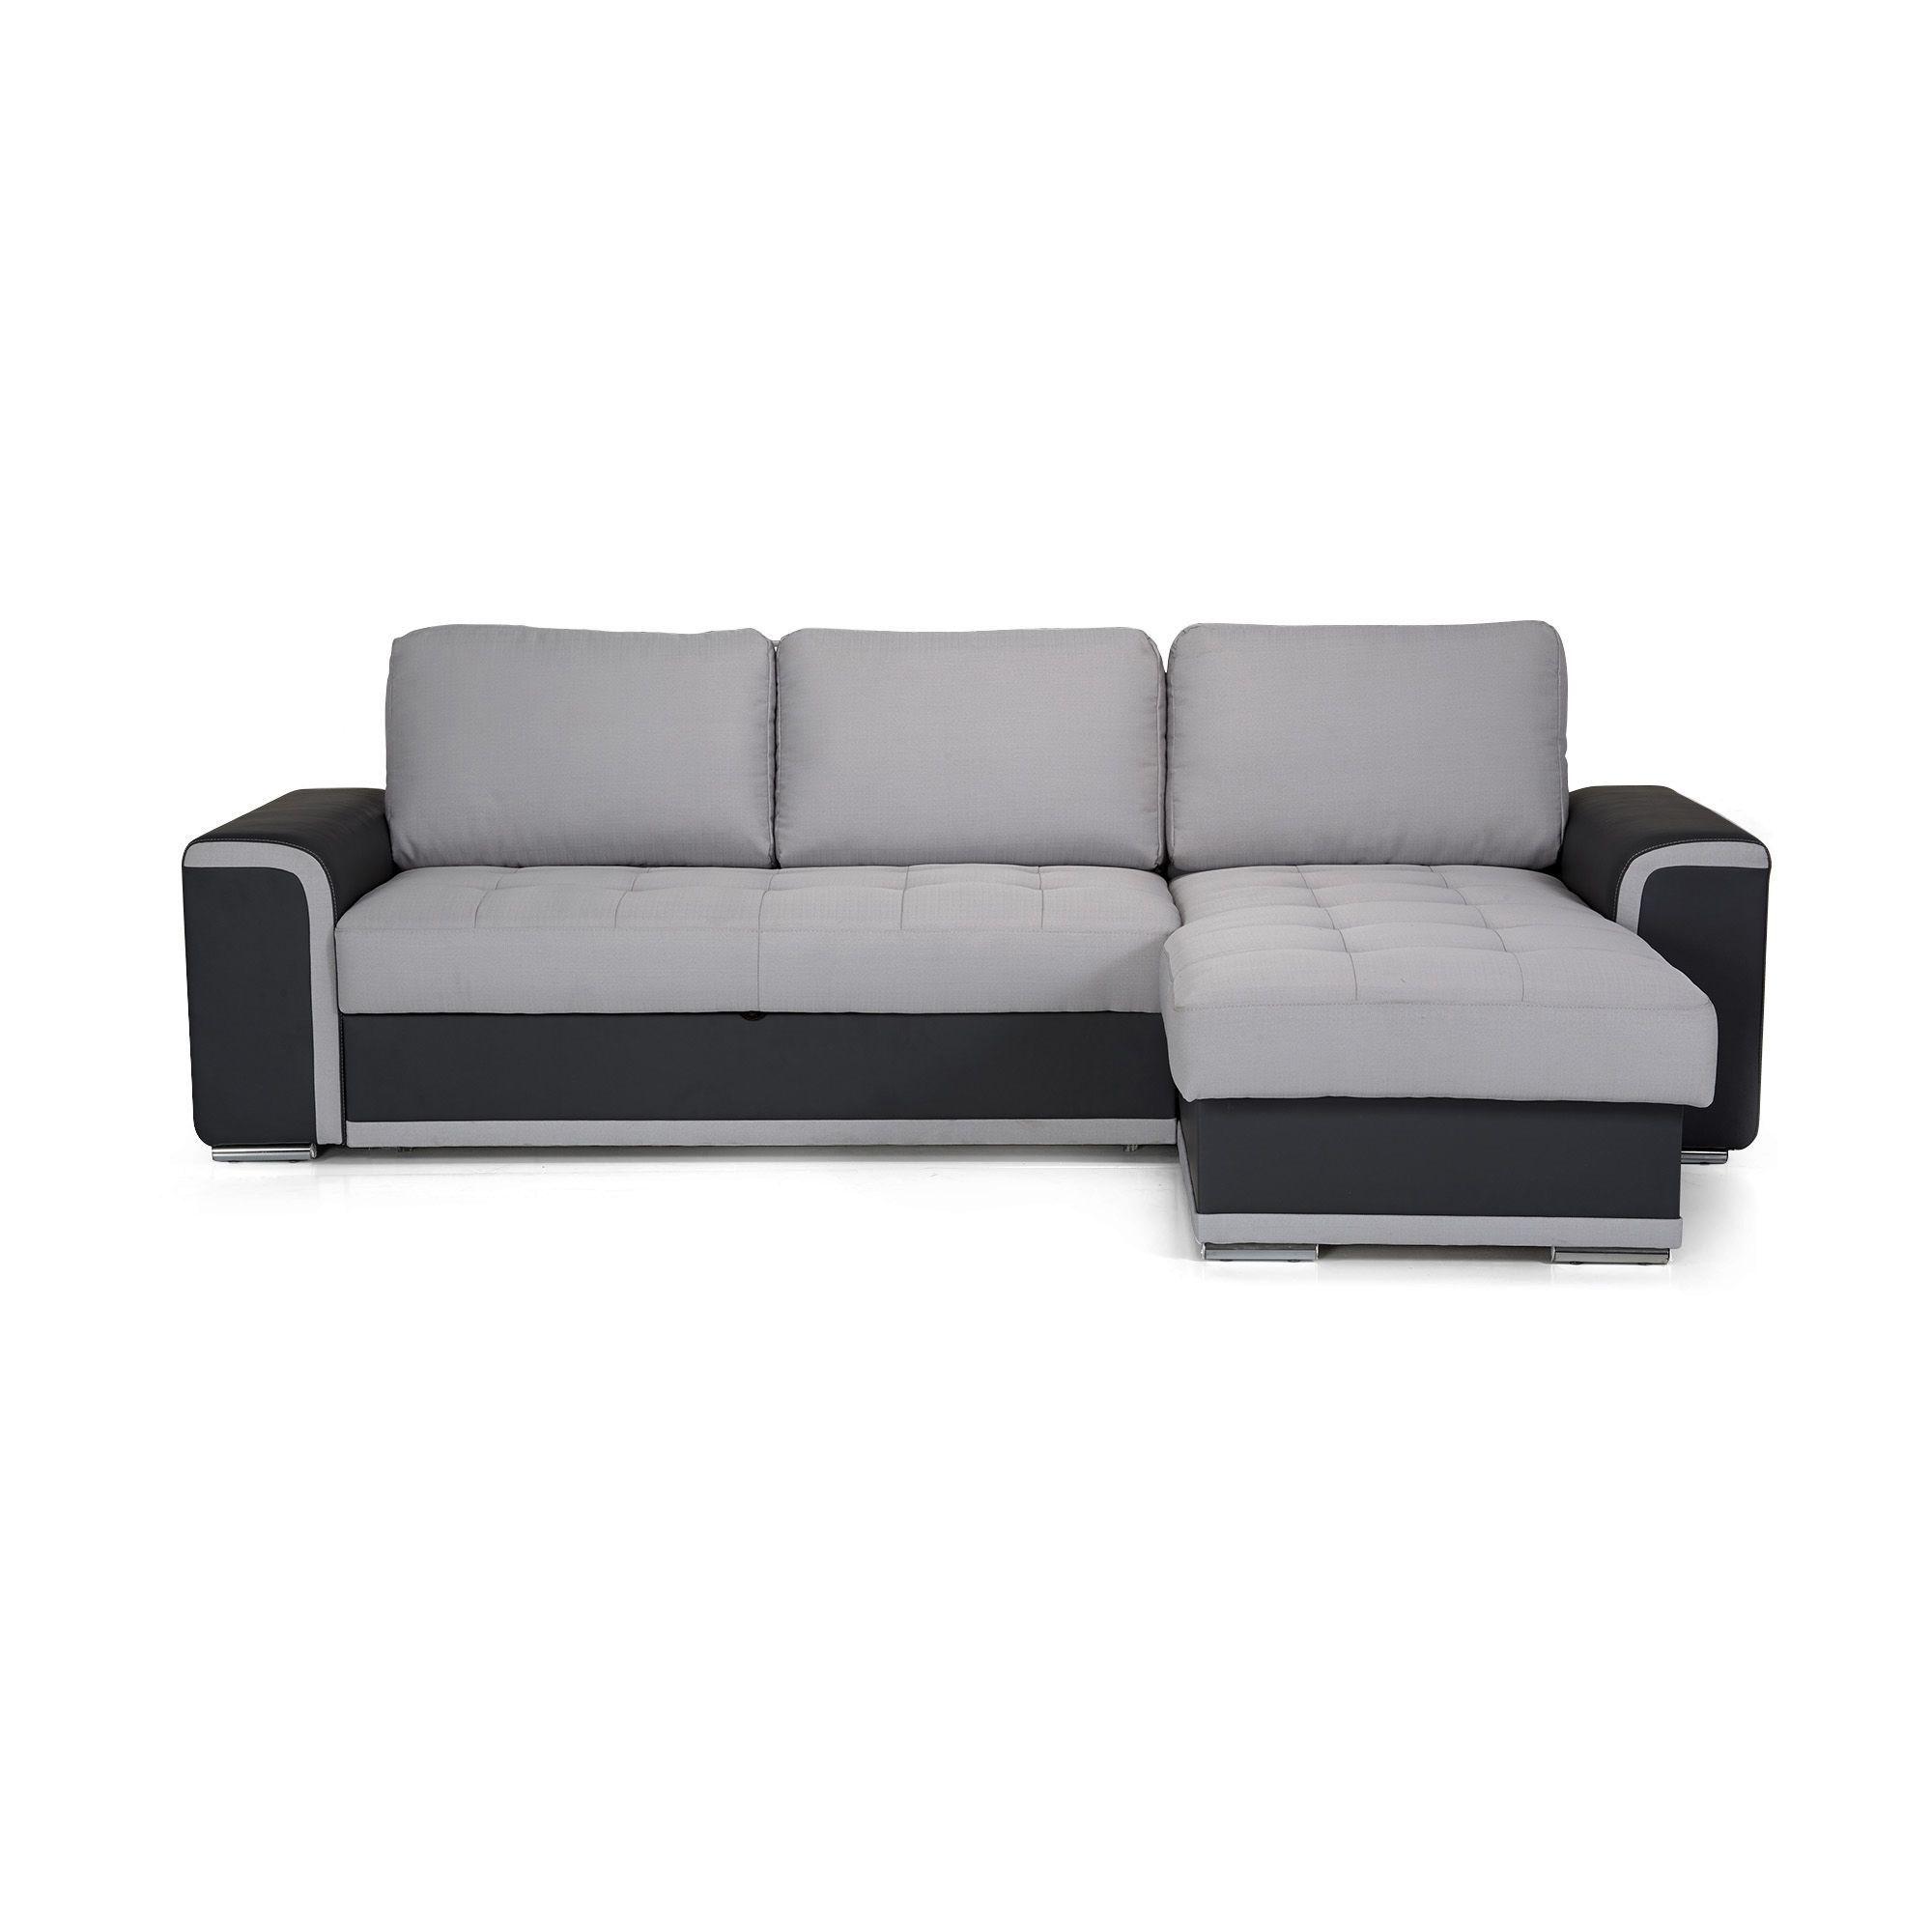 canape d angle alinea. Black Bedroom Furniture Sets. Home Design Ideas